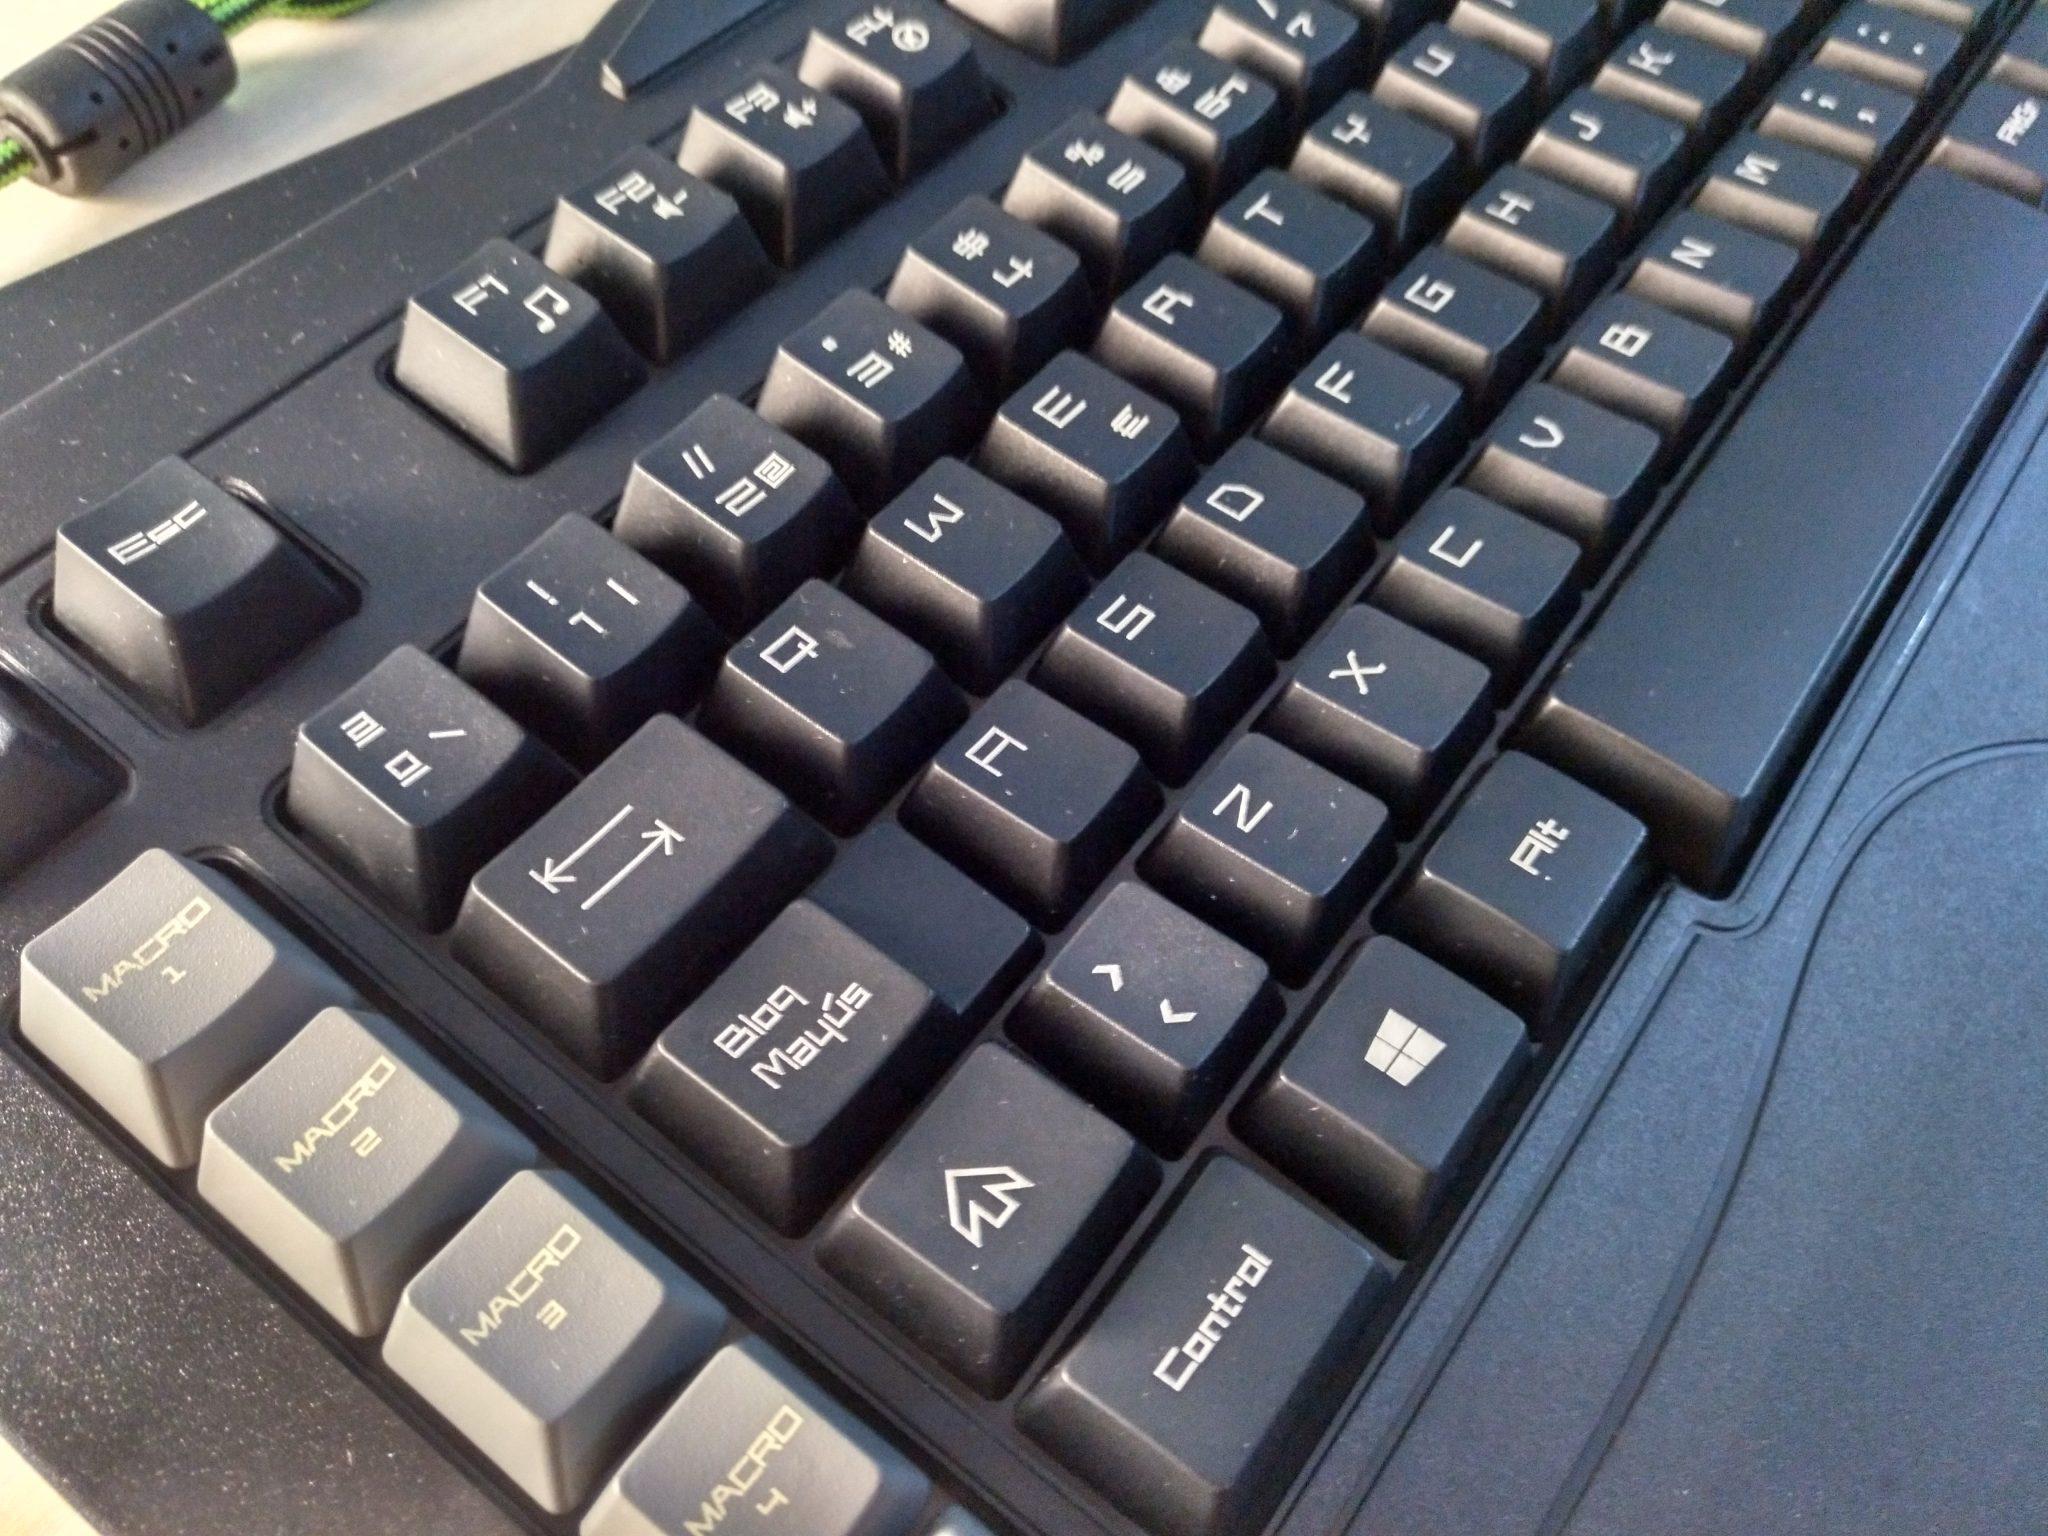 TECLADO GAMING KEEP OUT F89PT Review en Español